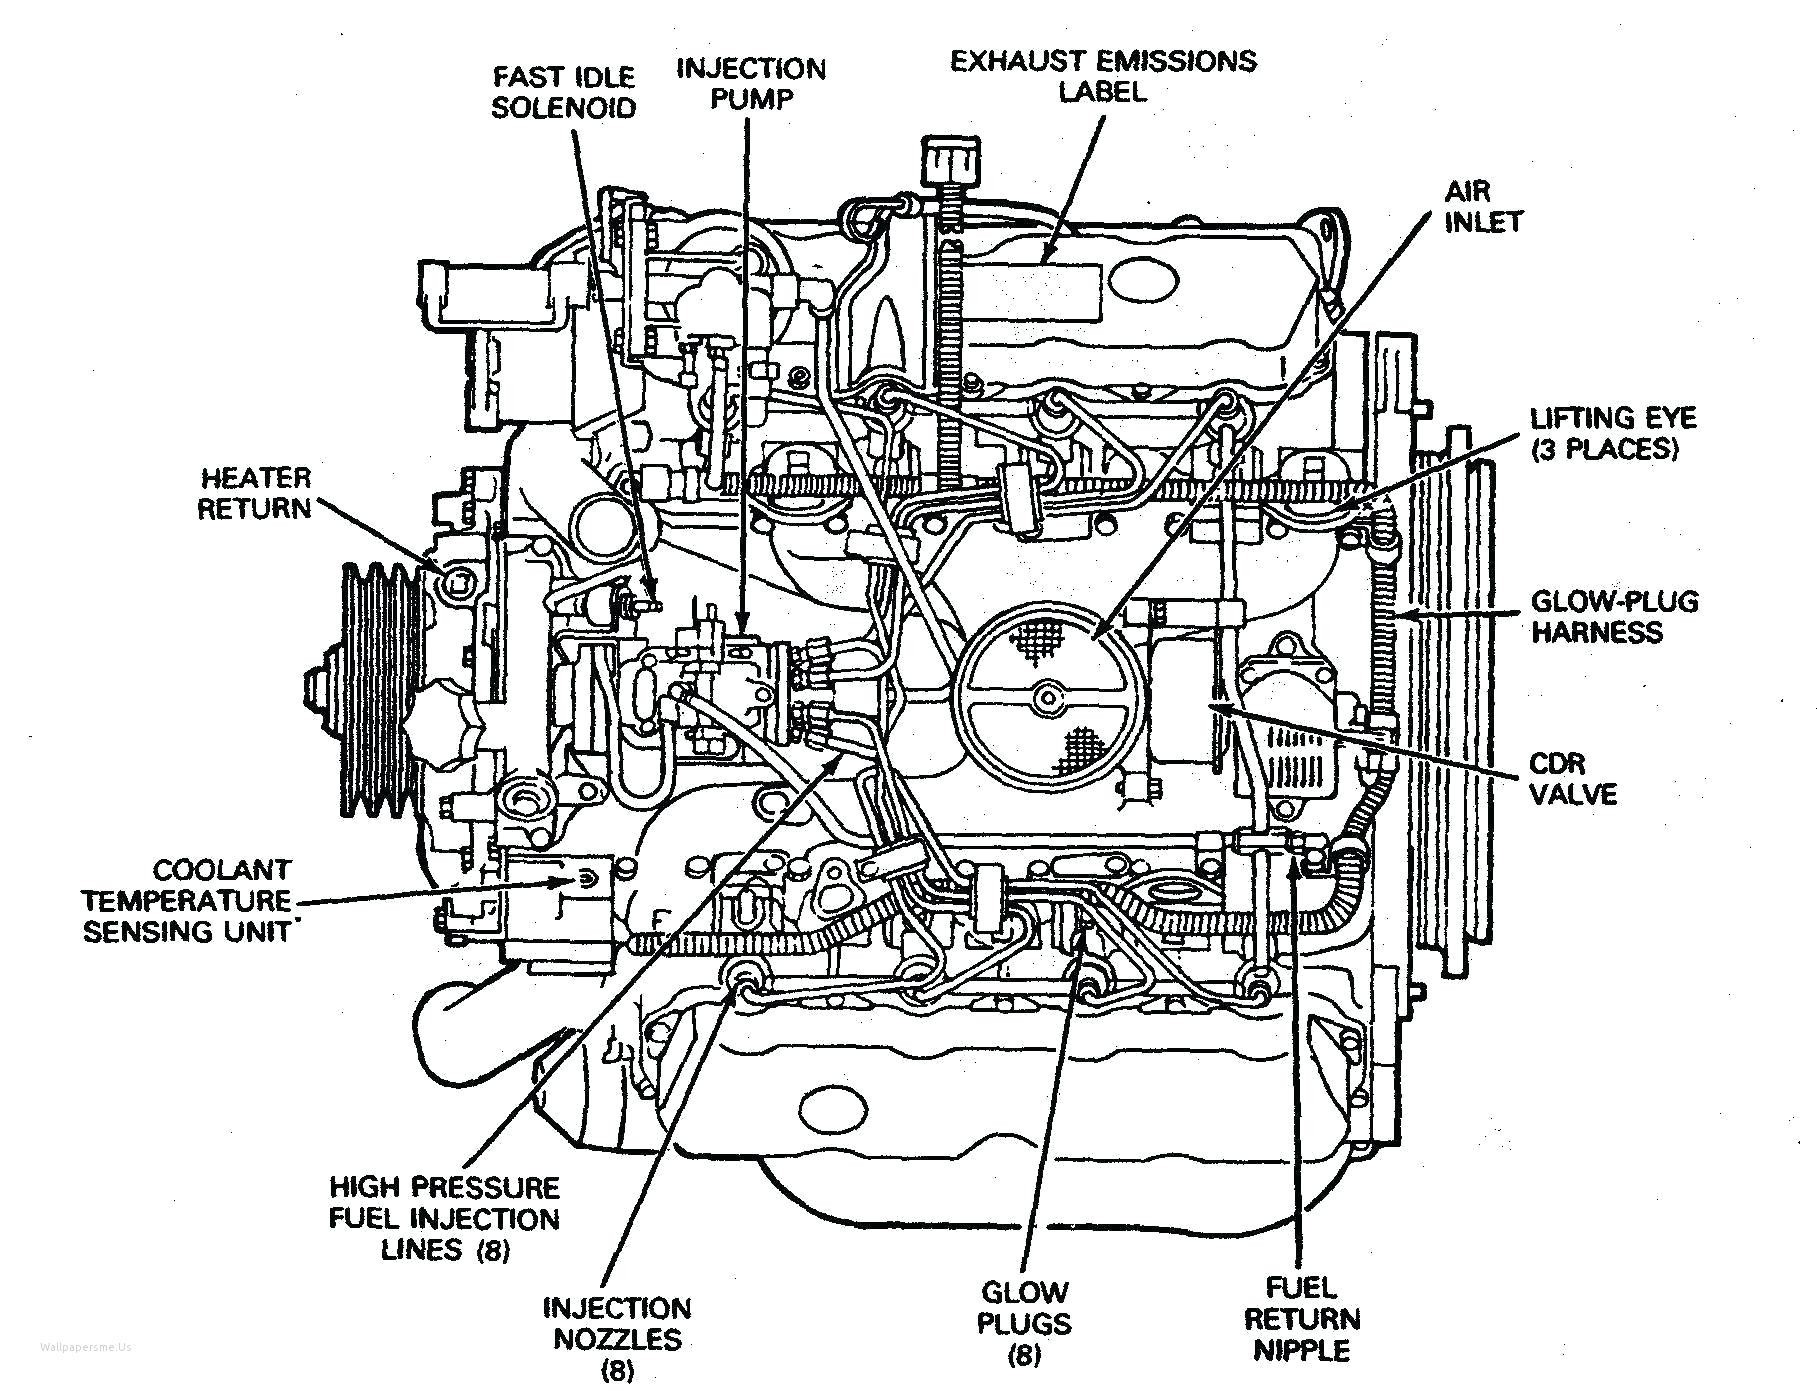 Car Engine Labeled Diagram Car Engine Diagram with Labeled Of Car Engine Labeled Diagram